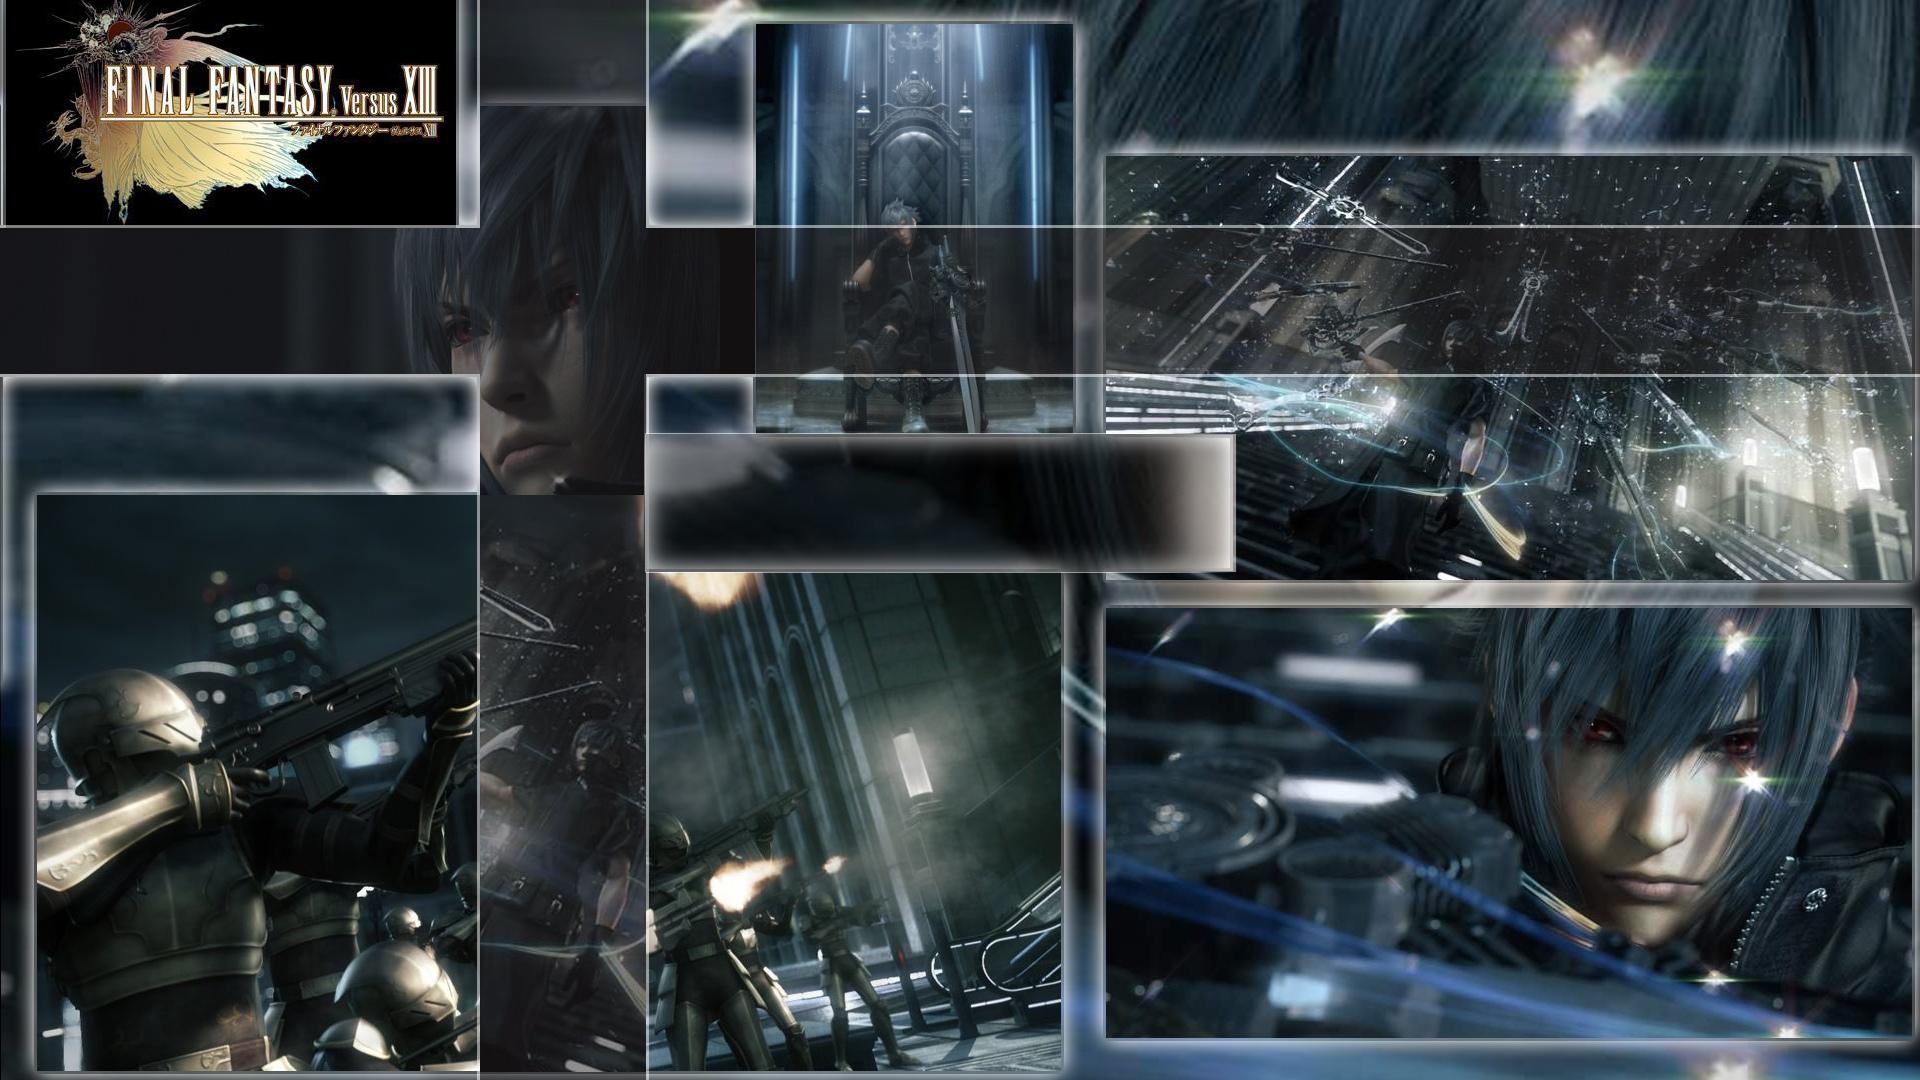 Final Fantasy Versus Xiii 11484 Hd Wallpaper